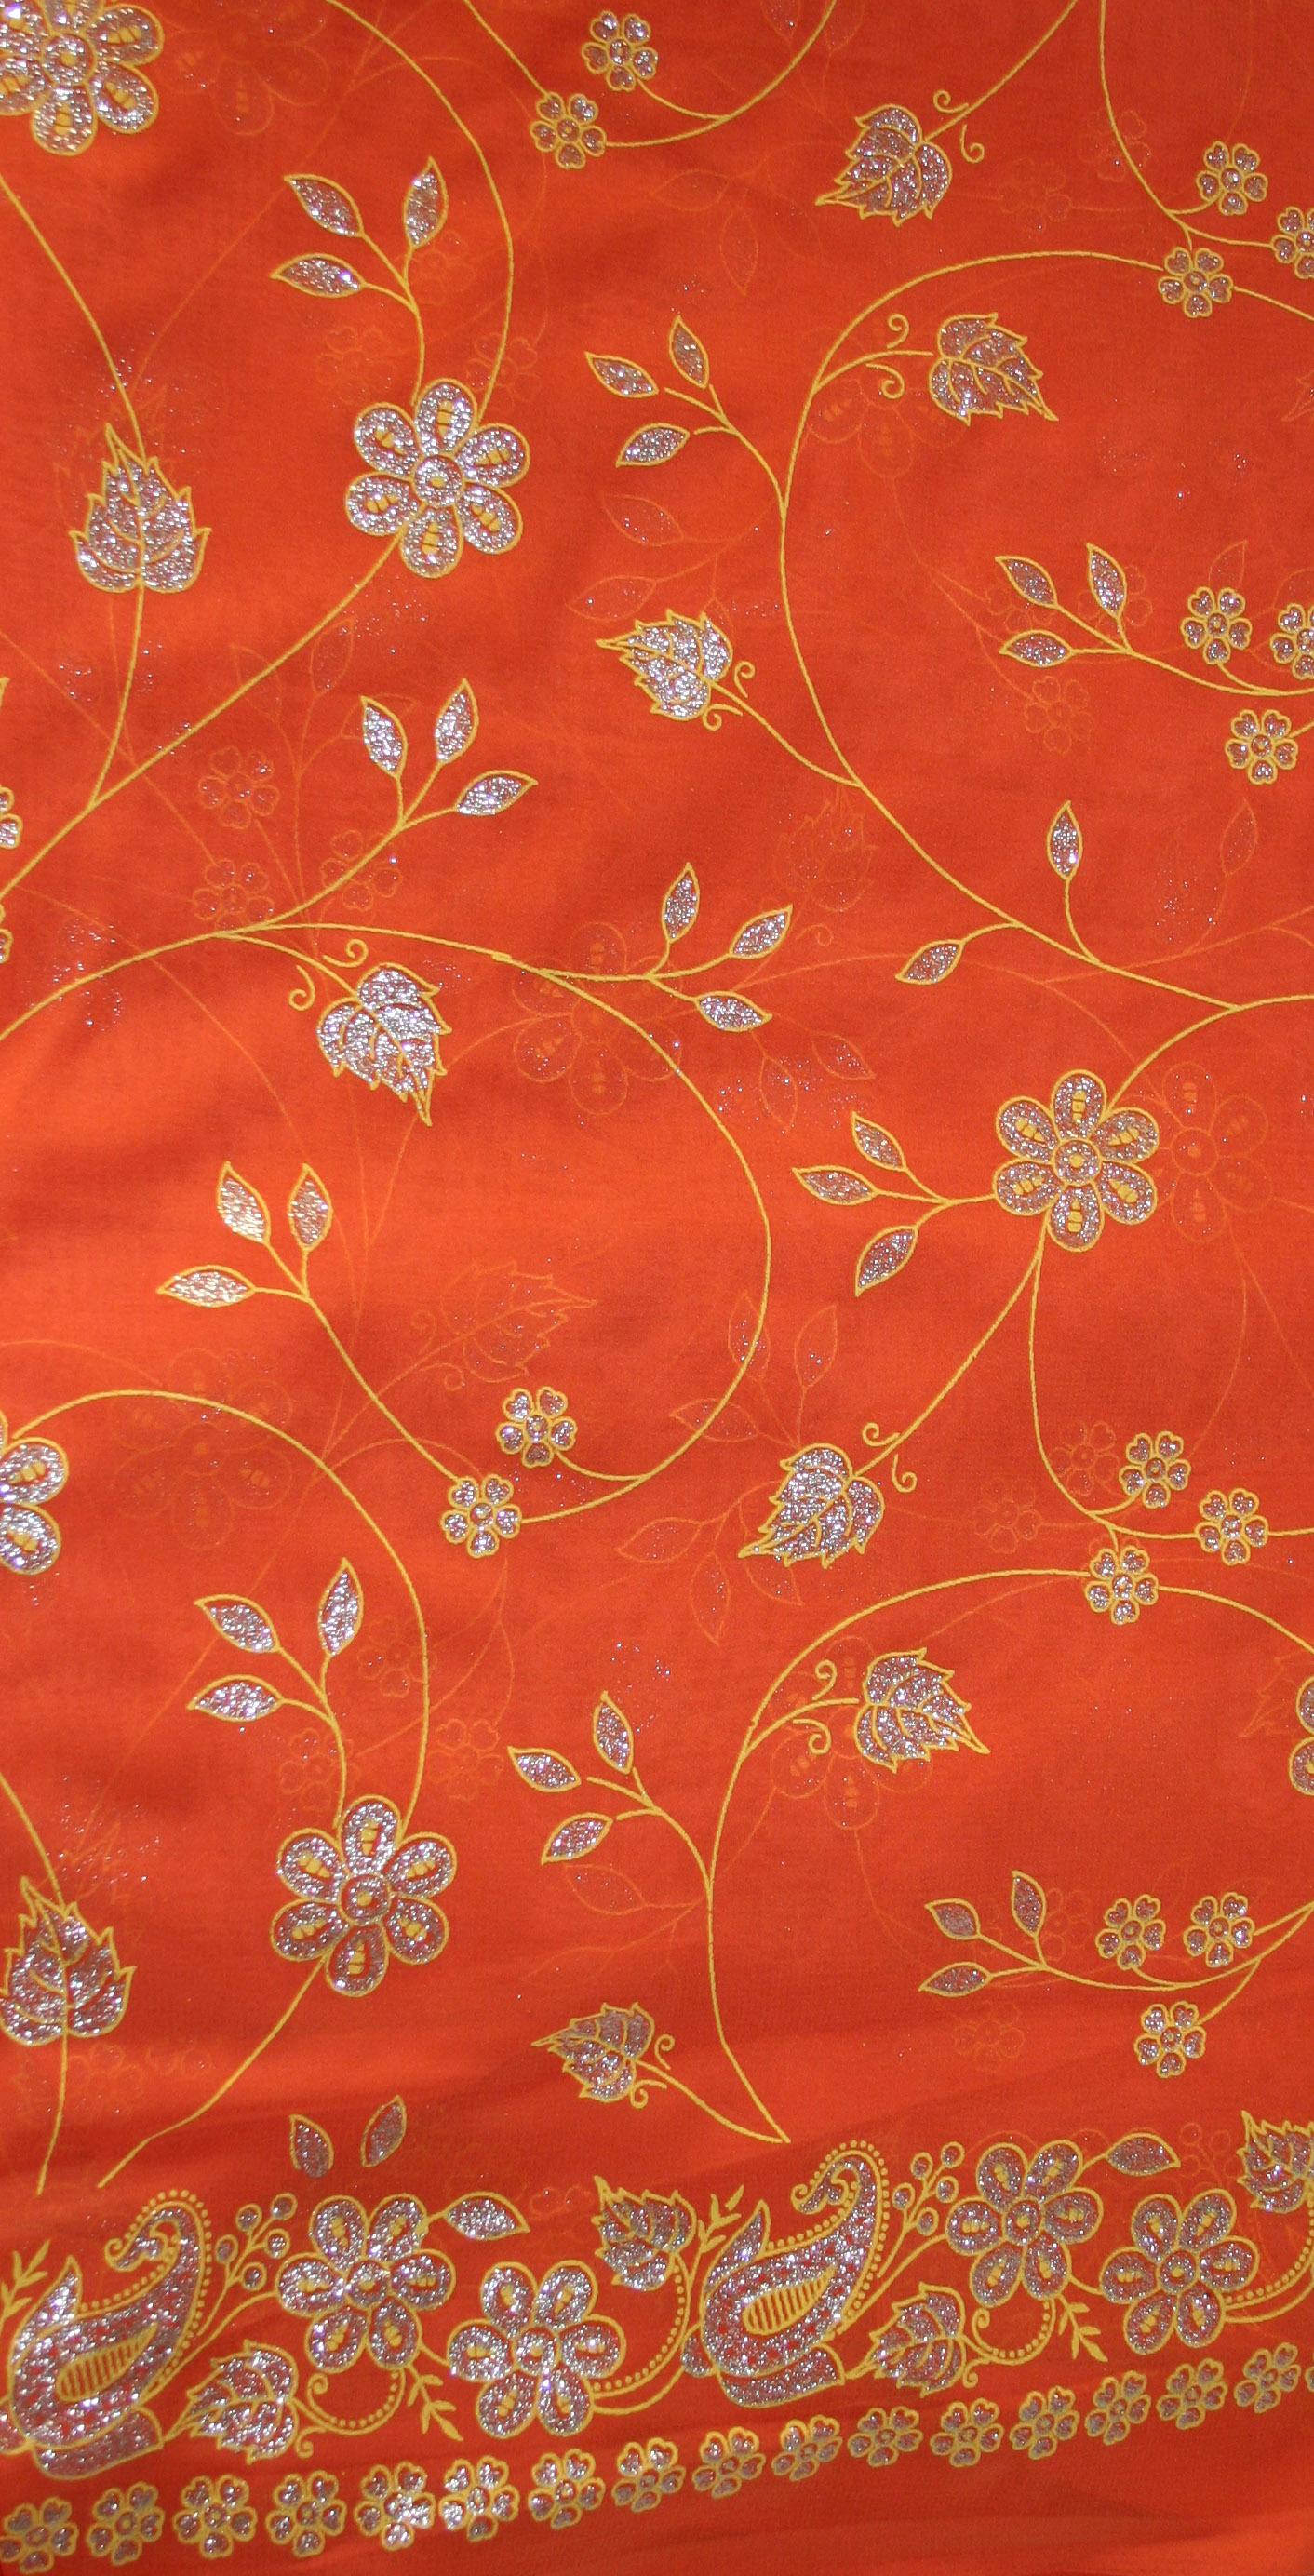 Sari Fabric 7 by Falln-Stock on DeviantArt